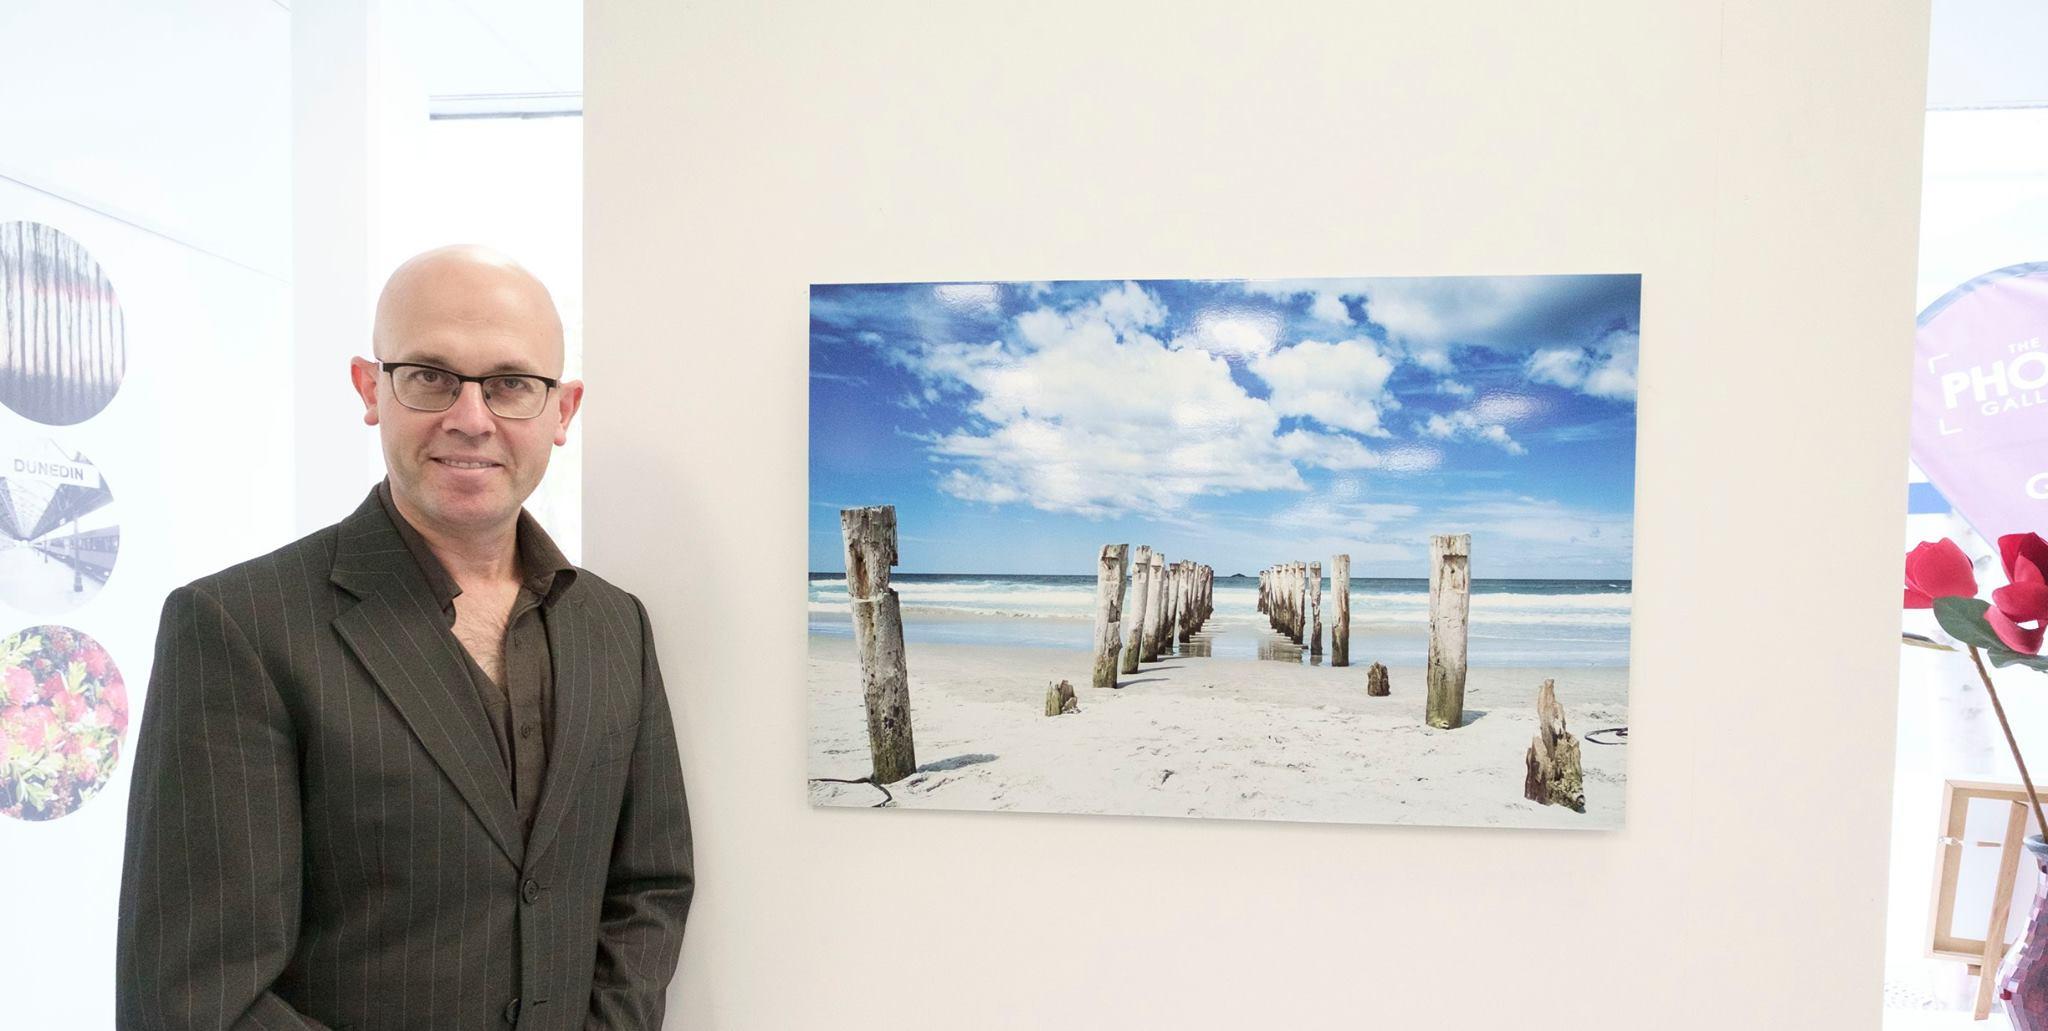 St Clair Beach Poles in Dunedin